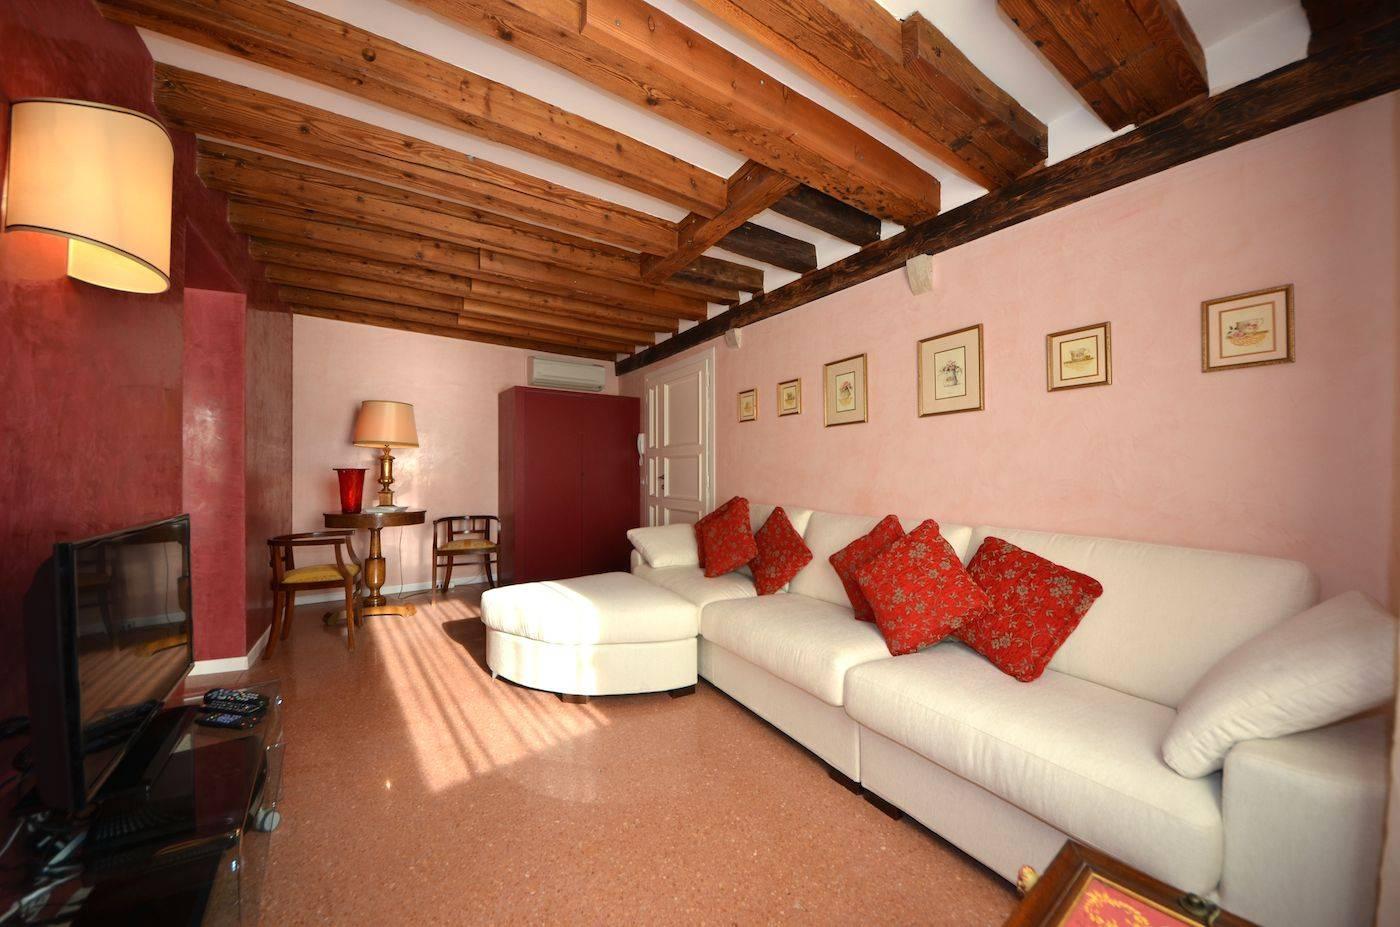 terrazzo veneziano flooring, stucco veneziano paint and wood-beamed ceilings